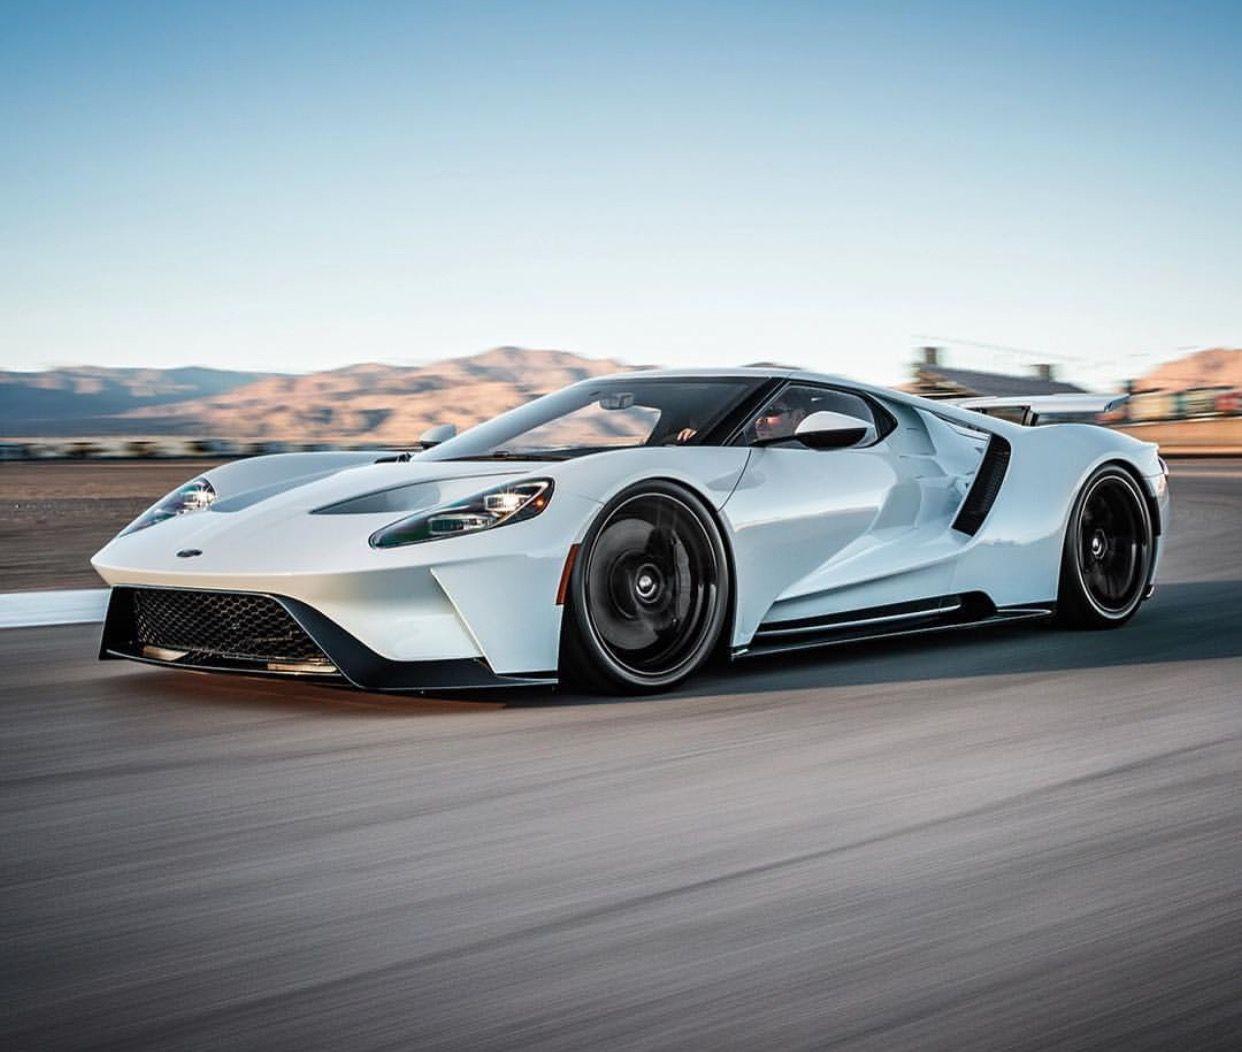 Mt Dubdub Ford Gt 速い車 スポーツカー フォードgt